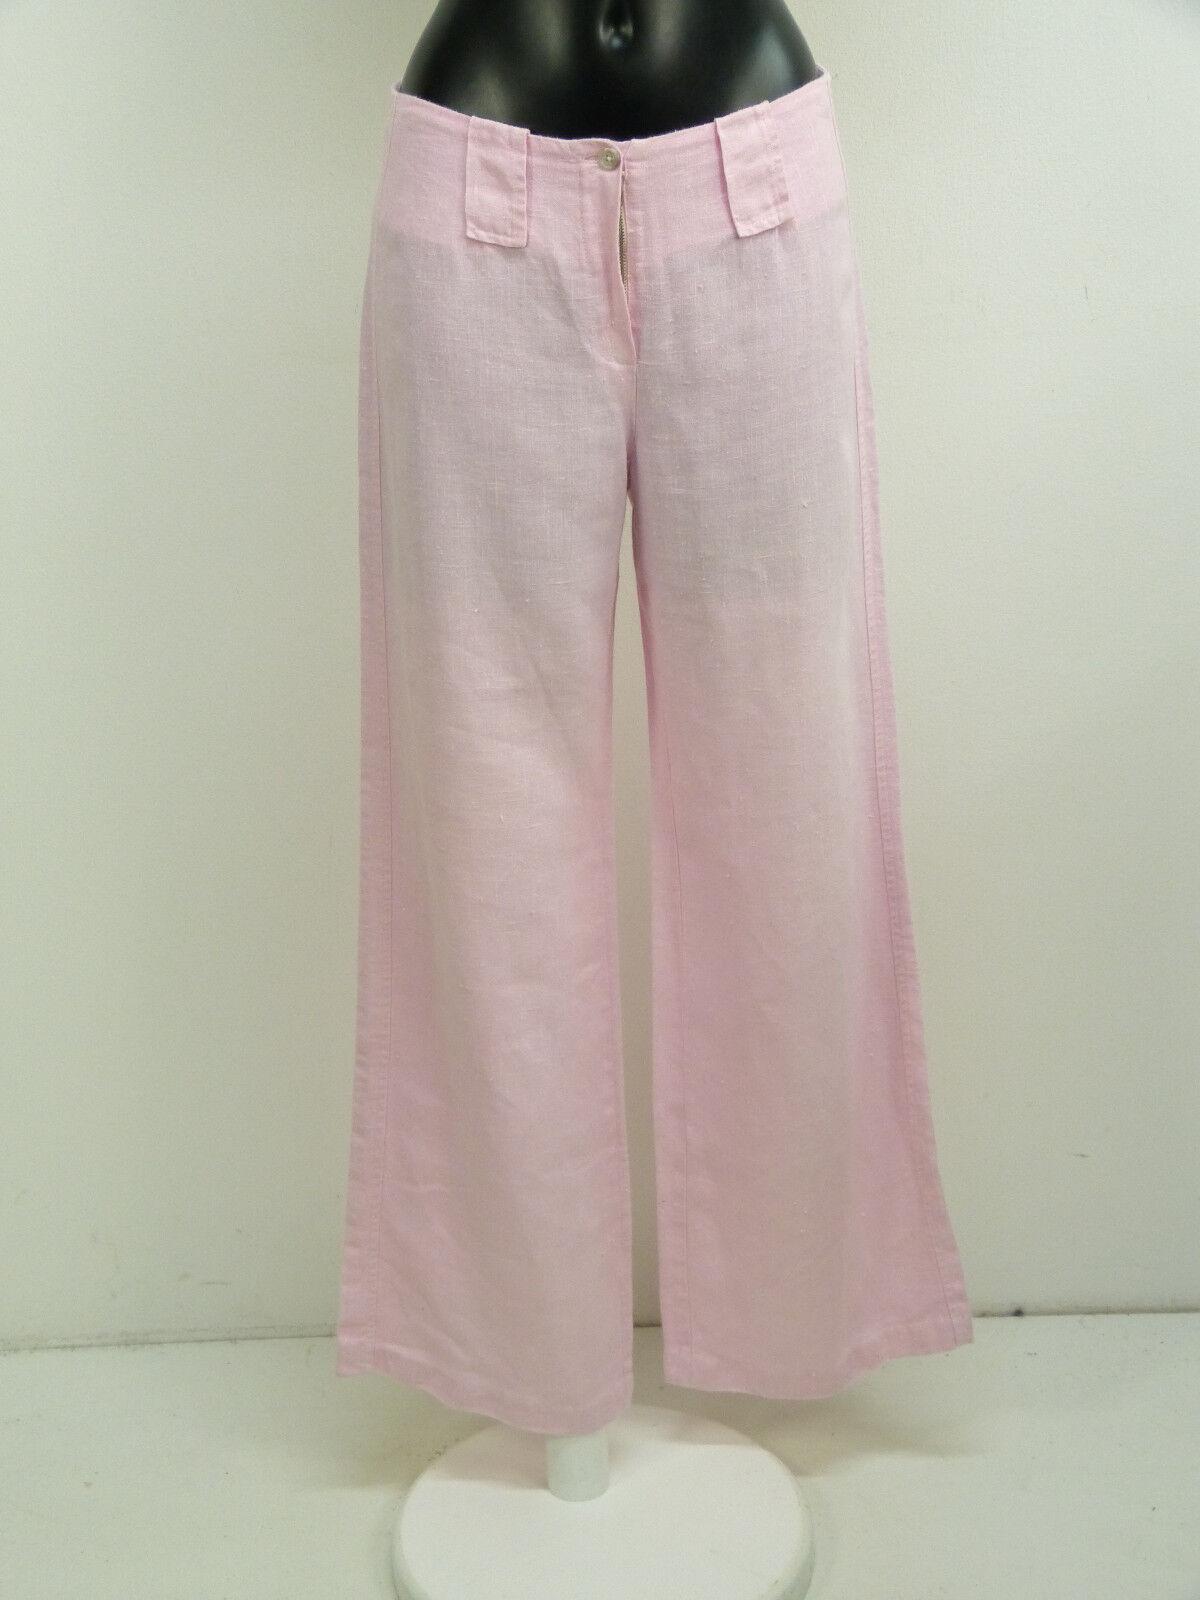 BOTTEGA LEINEN HOSE GR M   pink TON & NEUWERTIG - 100% LEINEN   ( O 9999 R )